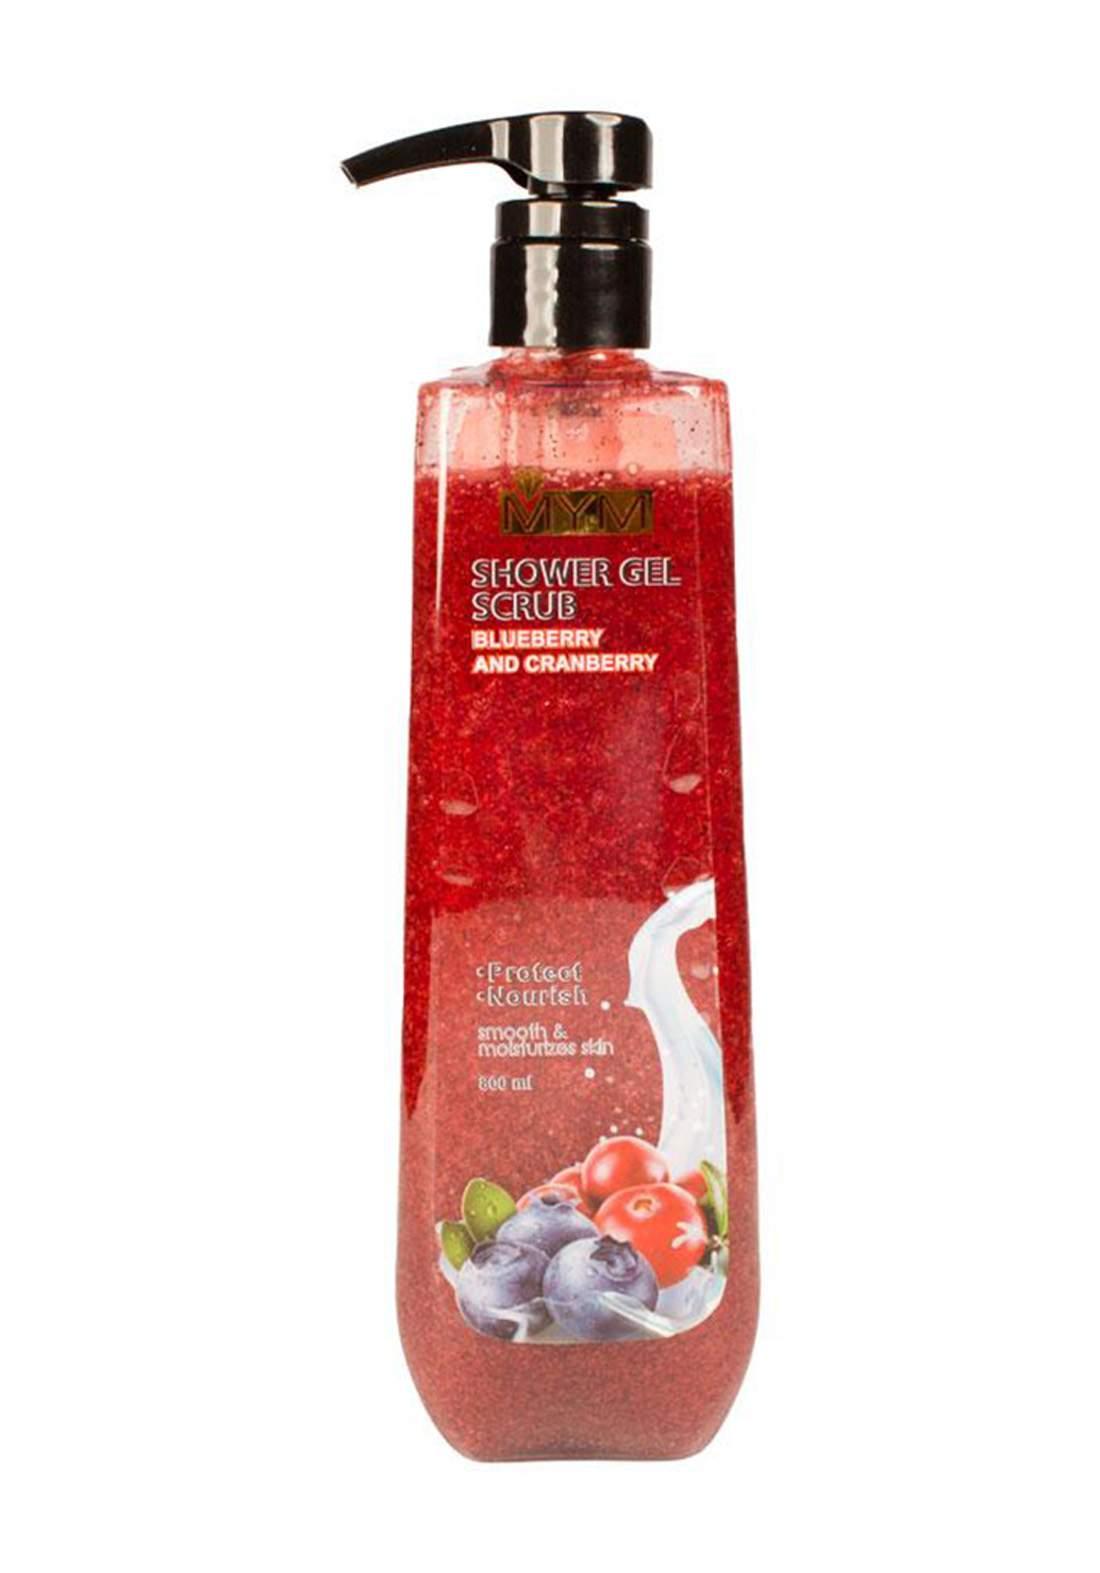 Mym Shower Gel  Scrub Blueberries 800ml  شاور جل مقشر